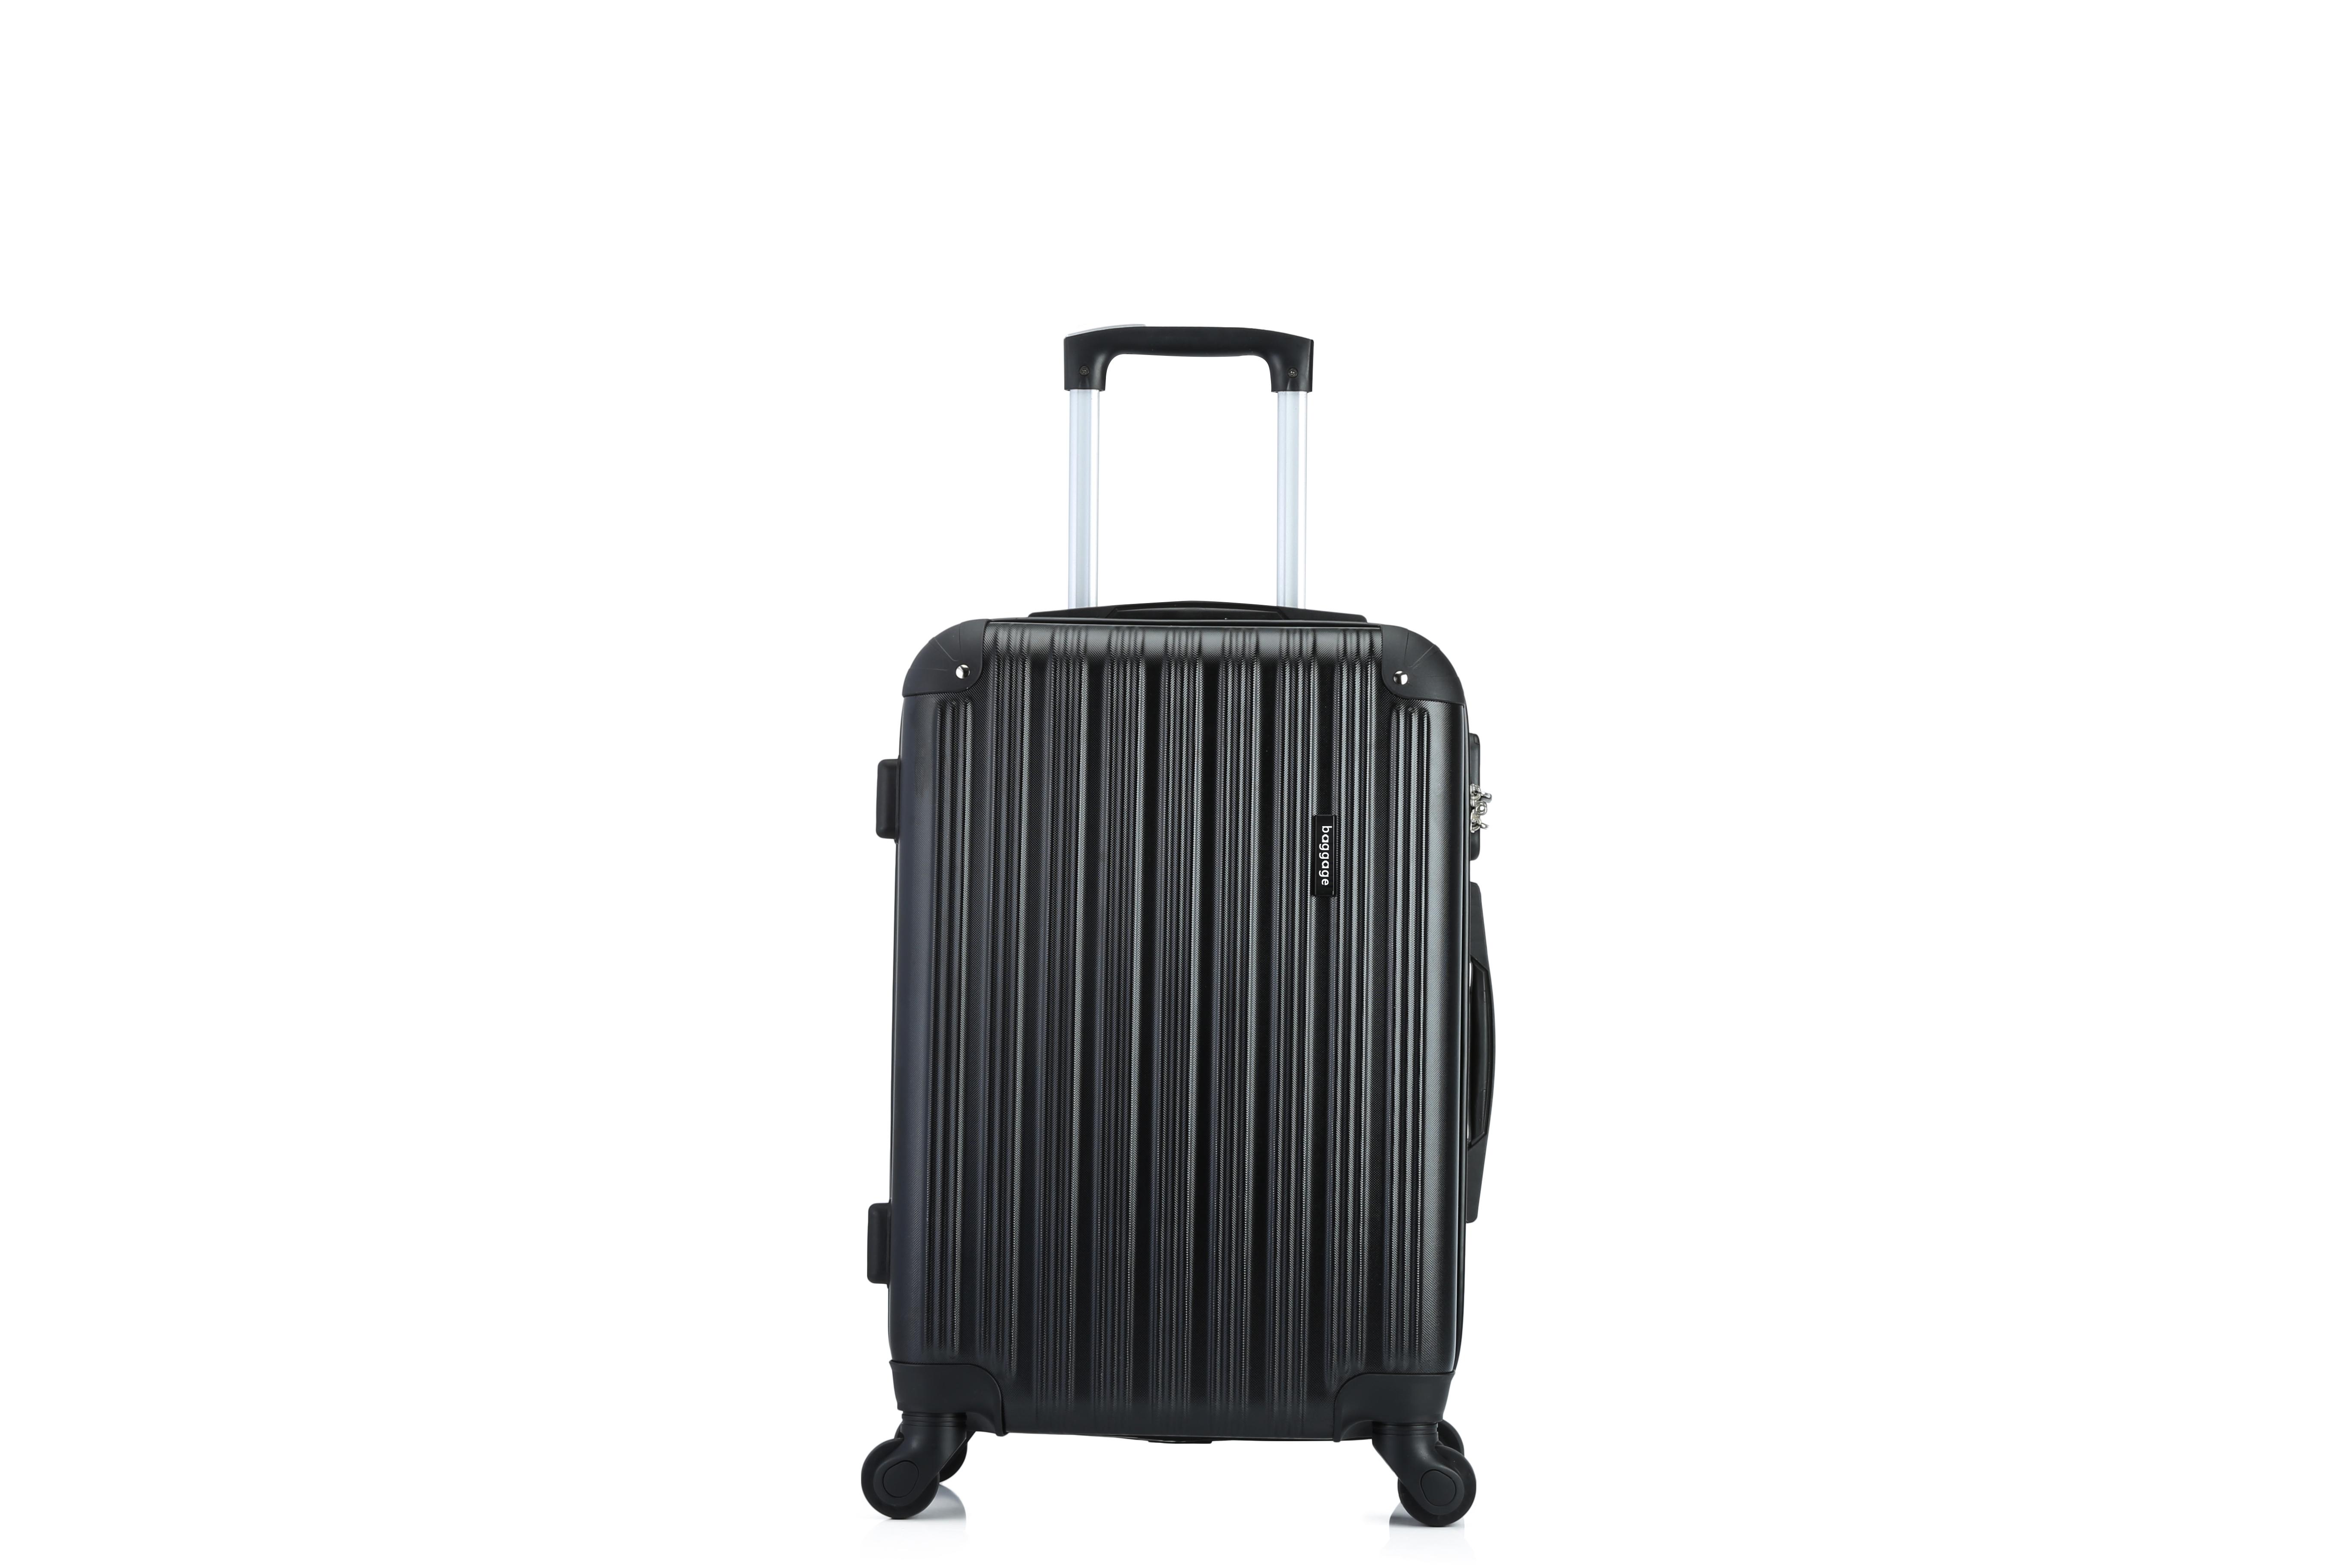 d0a3cf23000 Bagaggio lança mala feita com material PET